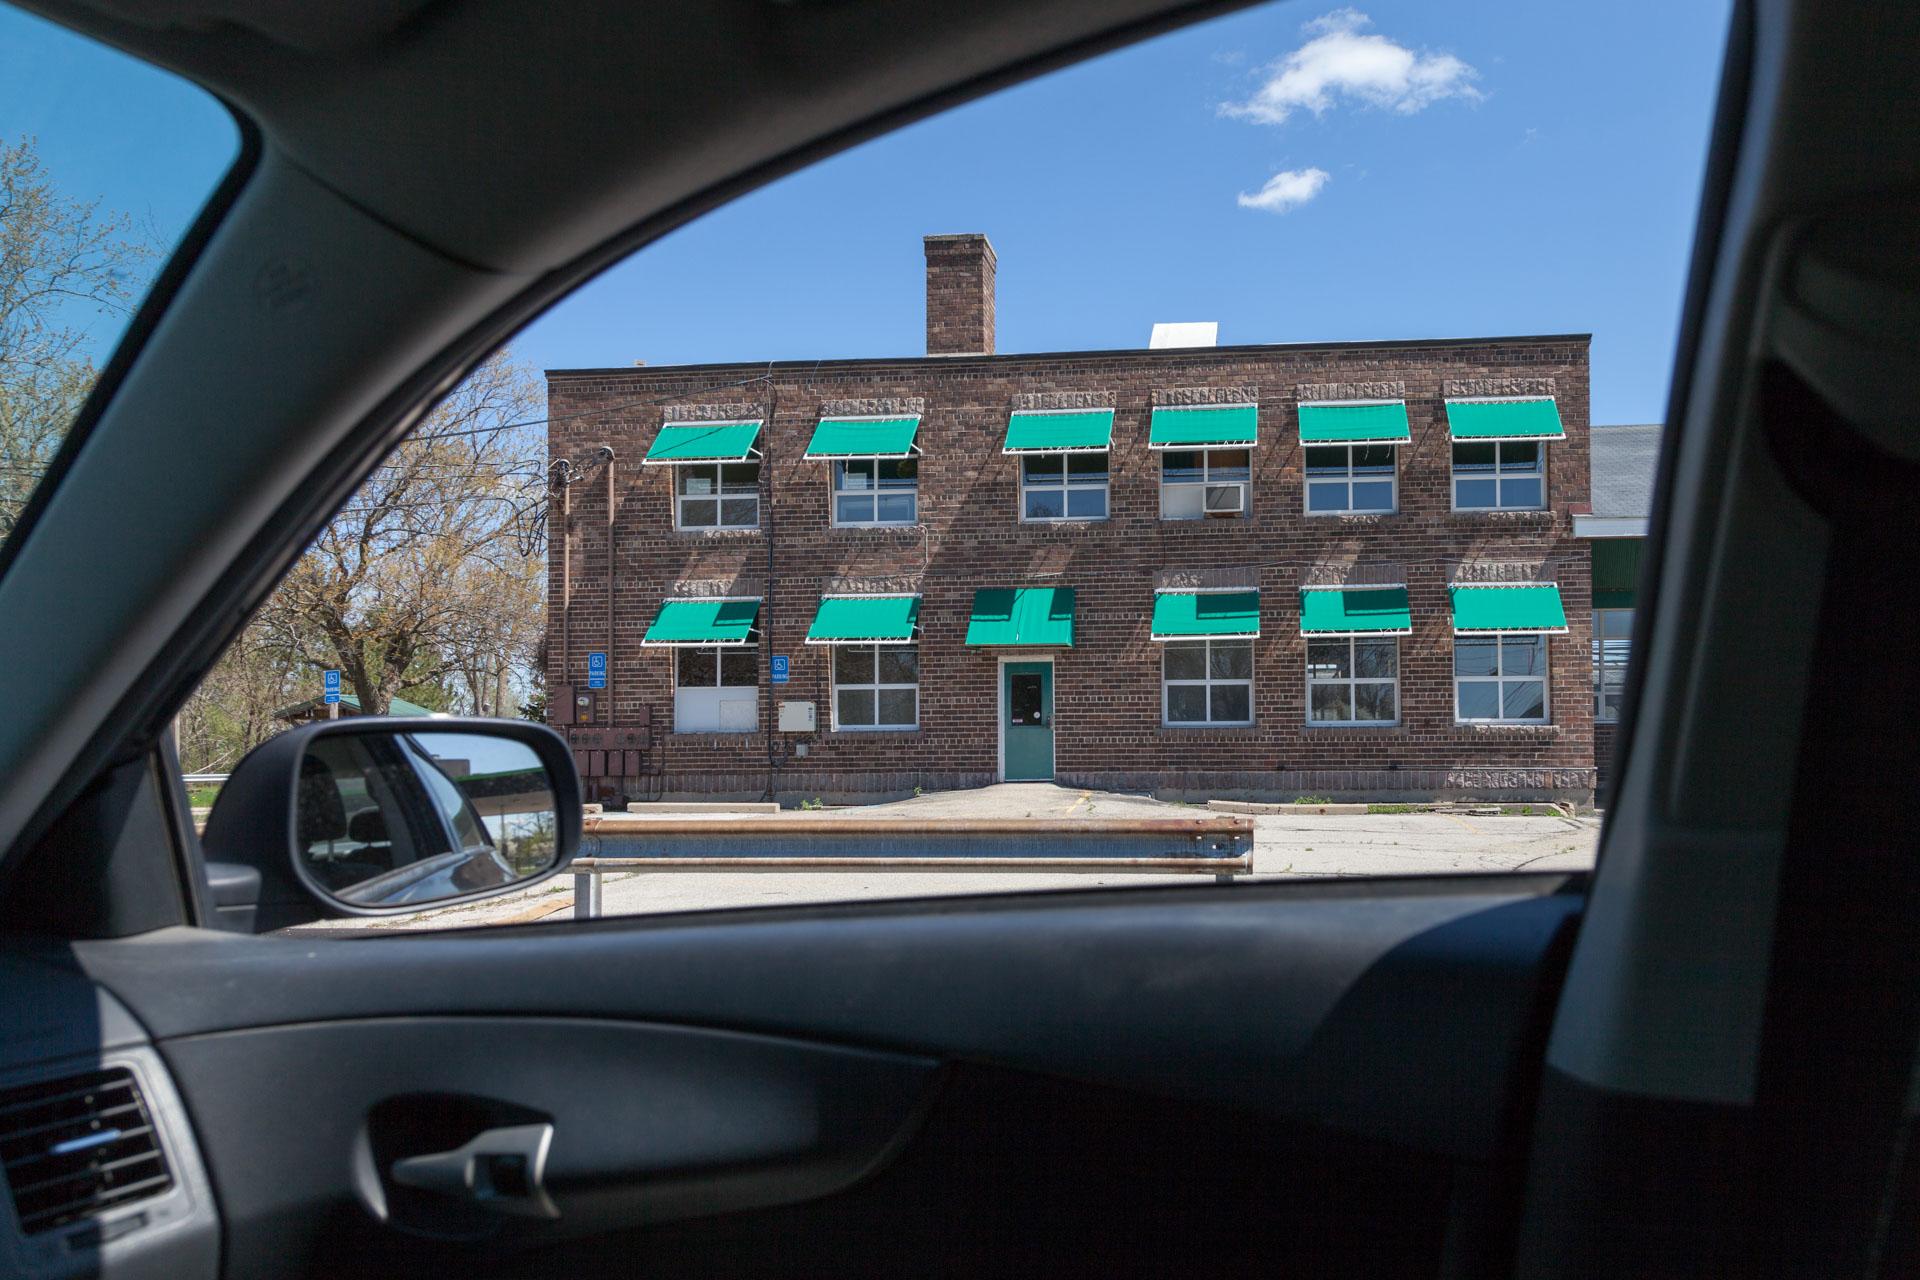 420 E Boulevard Dr., Old Flint Farmers Market